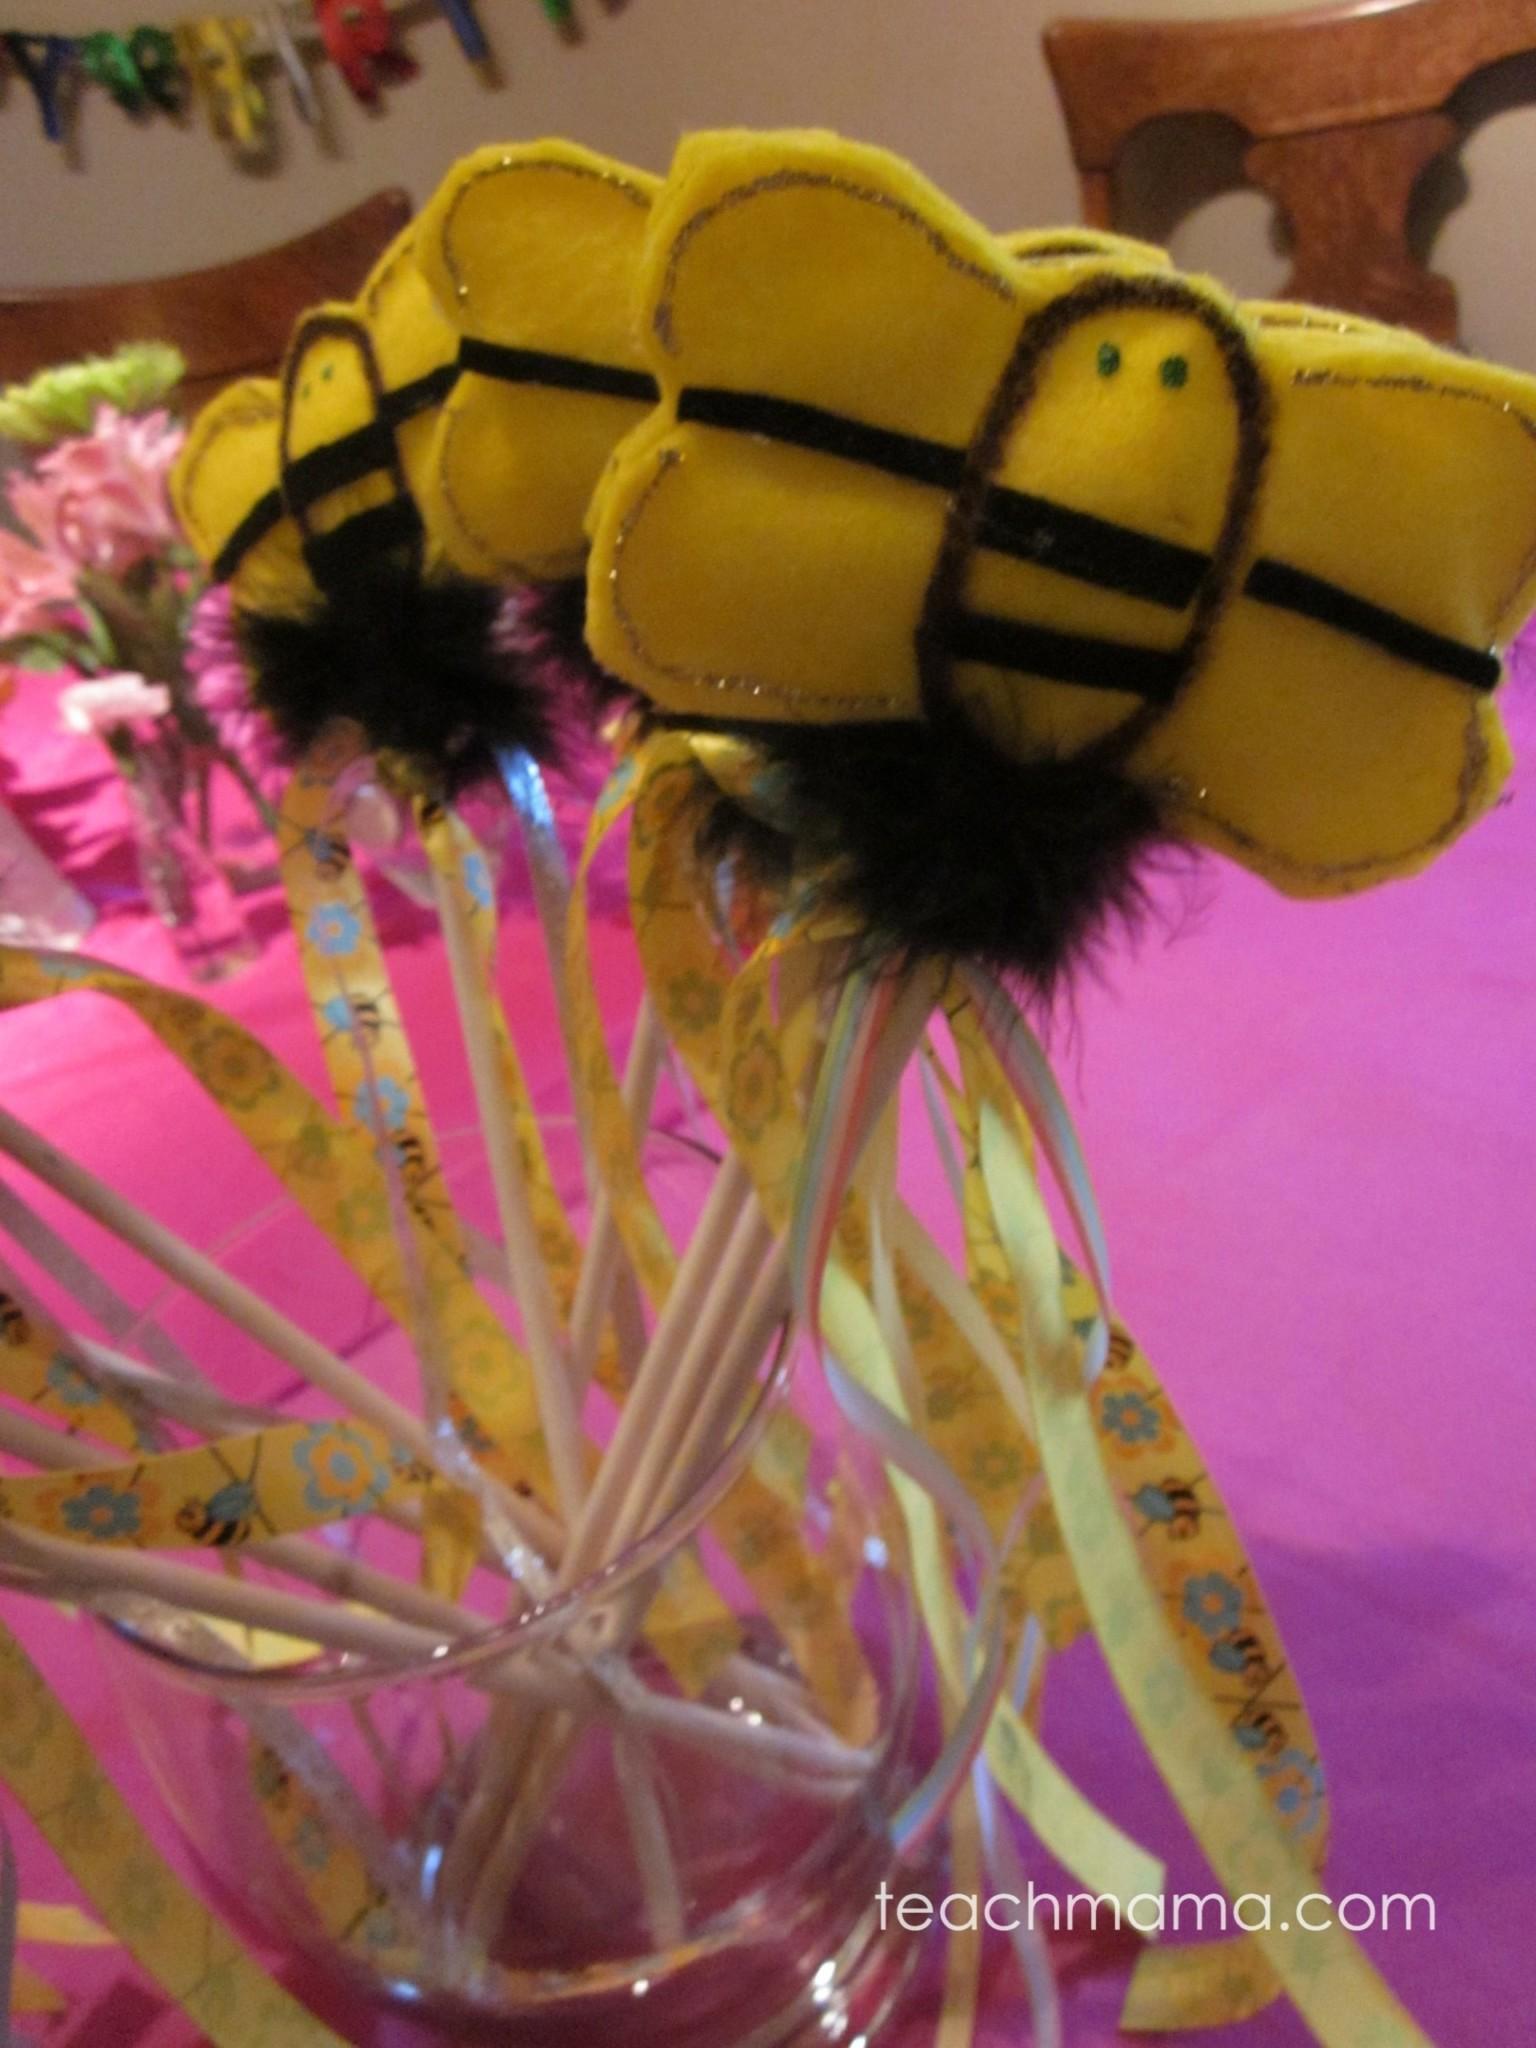 bumblebee birthday ideas: bumblebee wands, pens, games